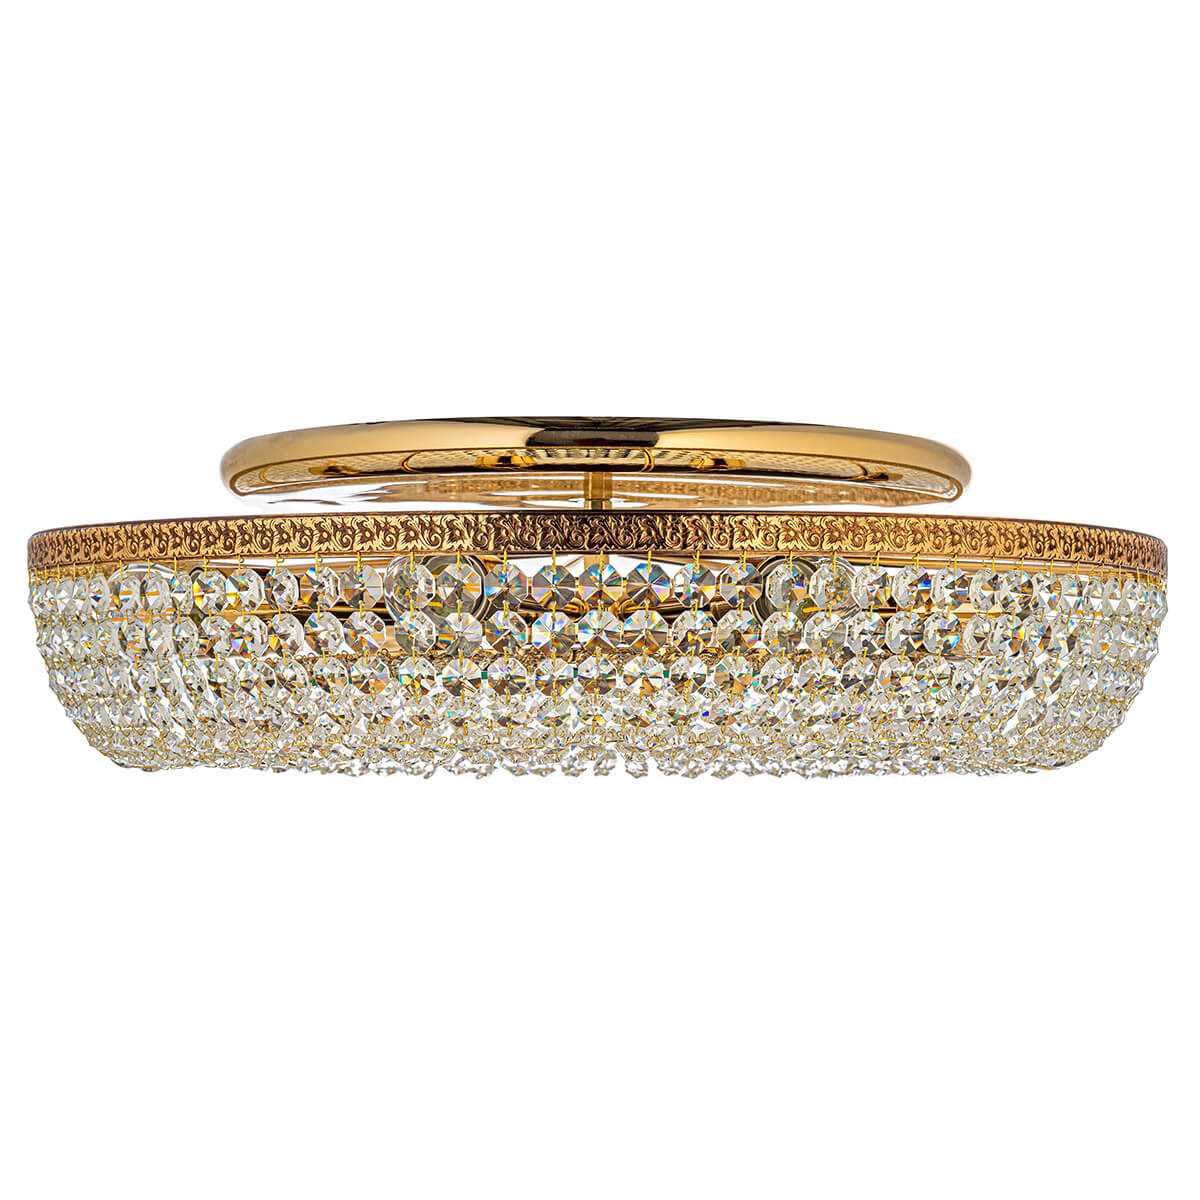 Светильник Arti Lampadari Favola LE 1.4.60.502 G Gold